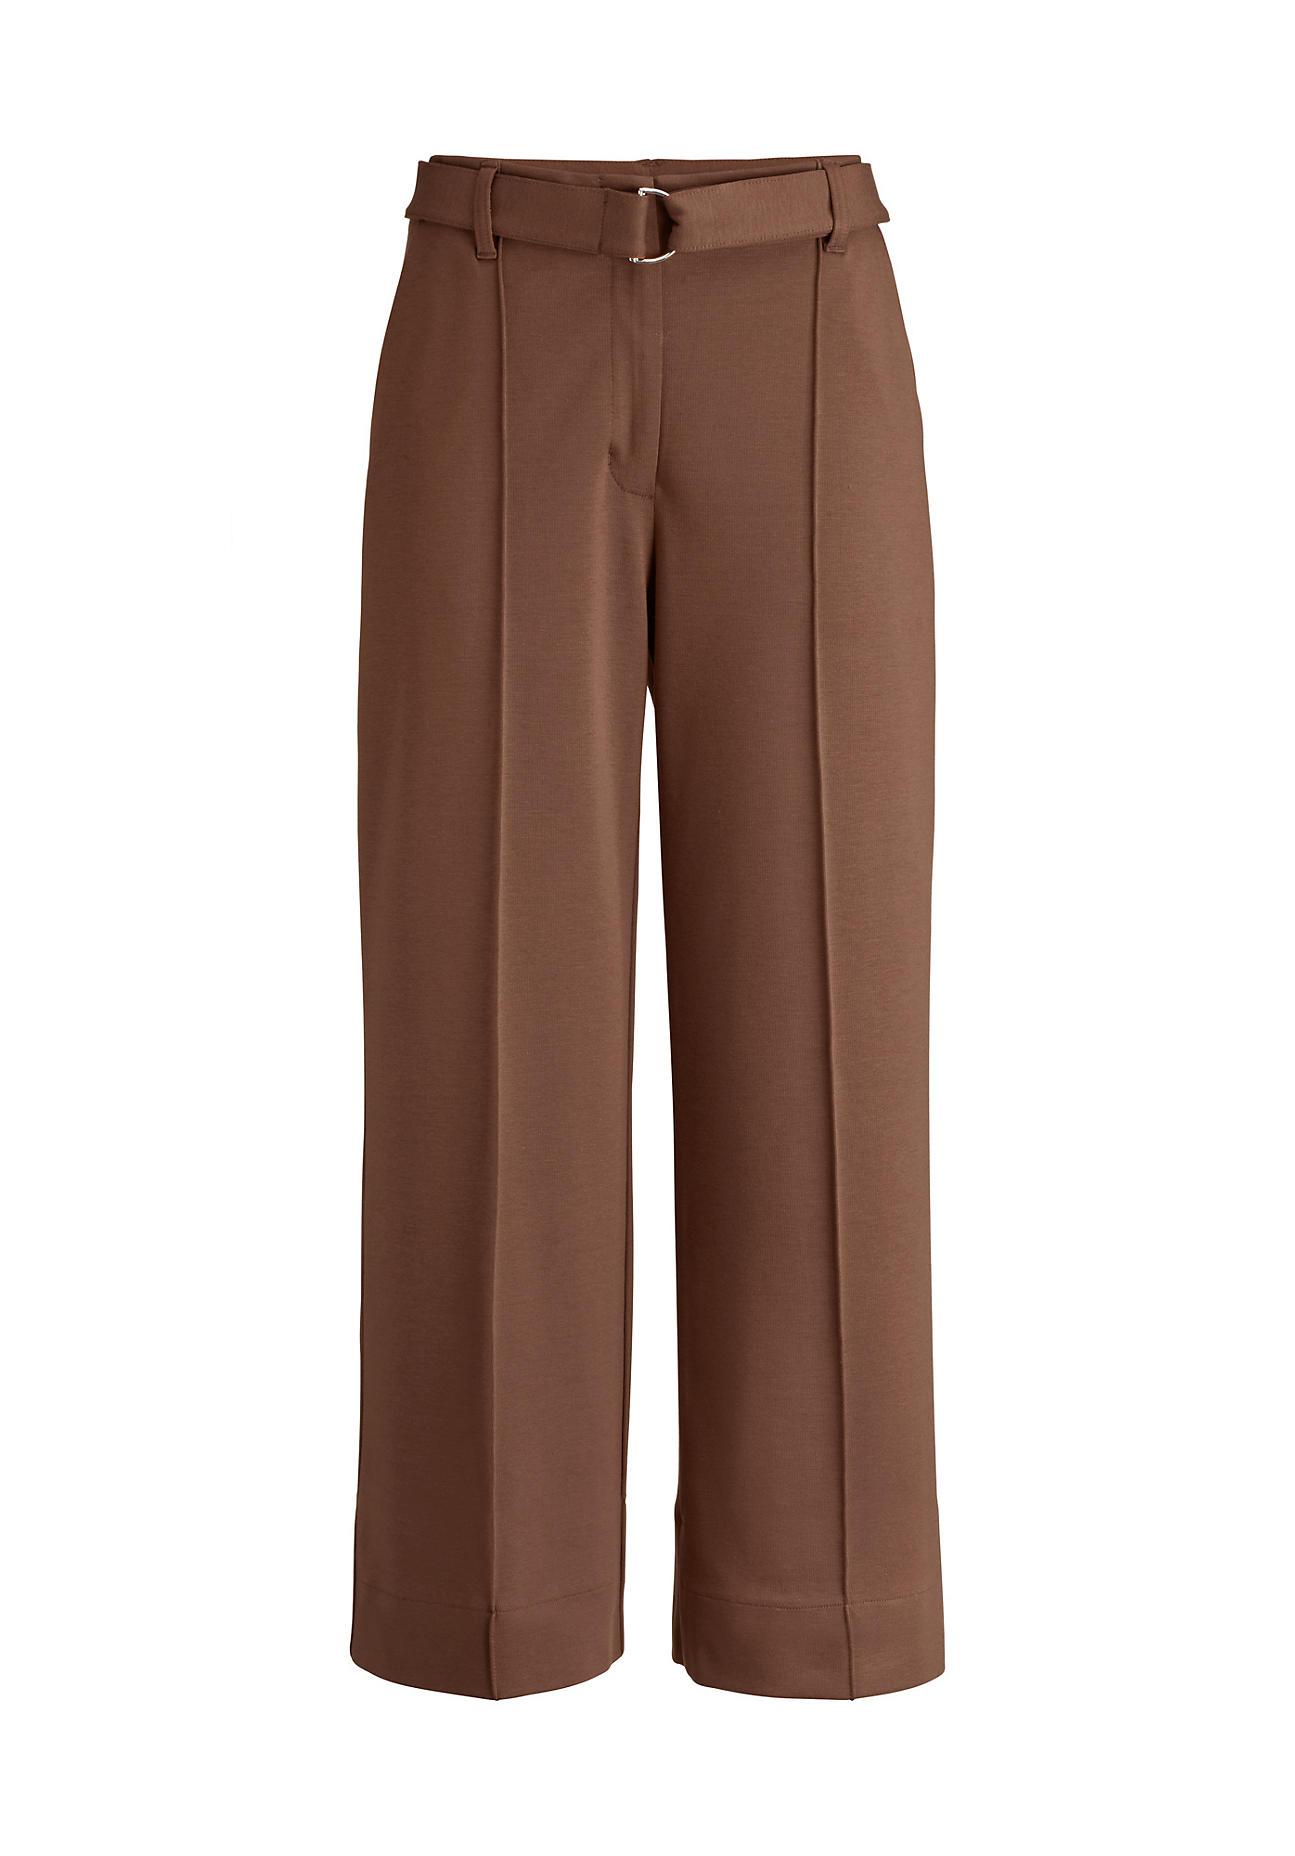 Hosen - hessnatur Damen Jersey Culotte aus Bio Baumwolle mit TENCEL™Modal – braun –  - Onlineshop Hessnatur